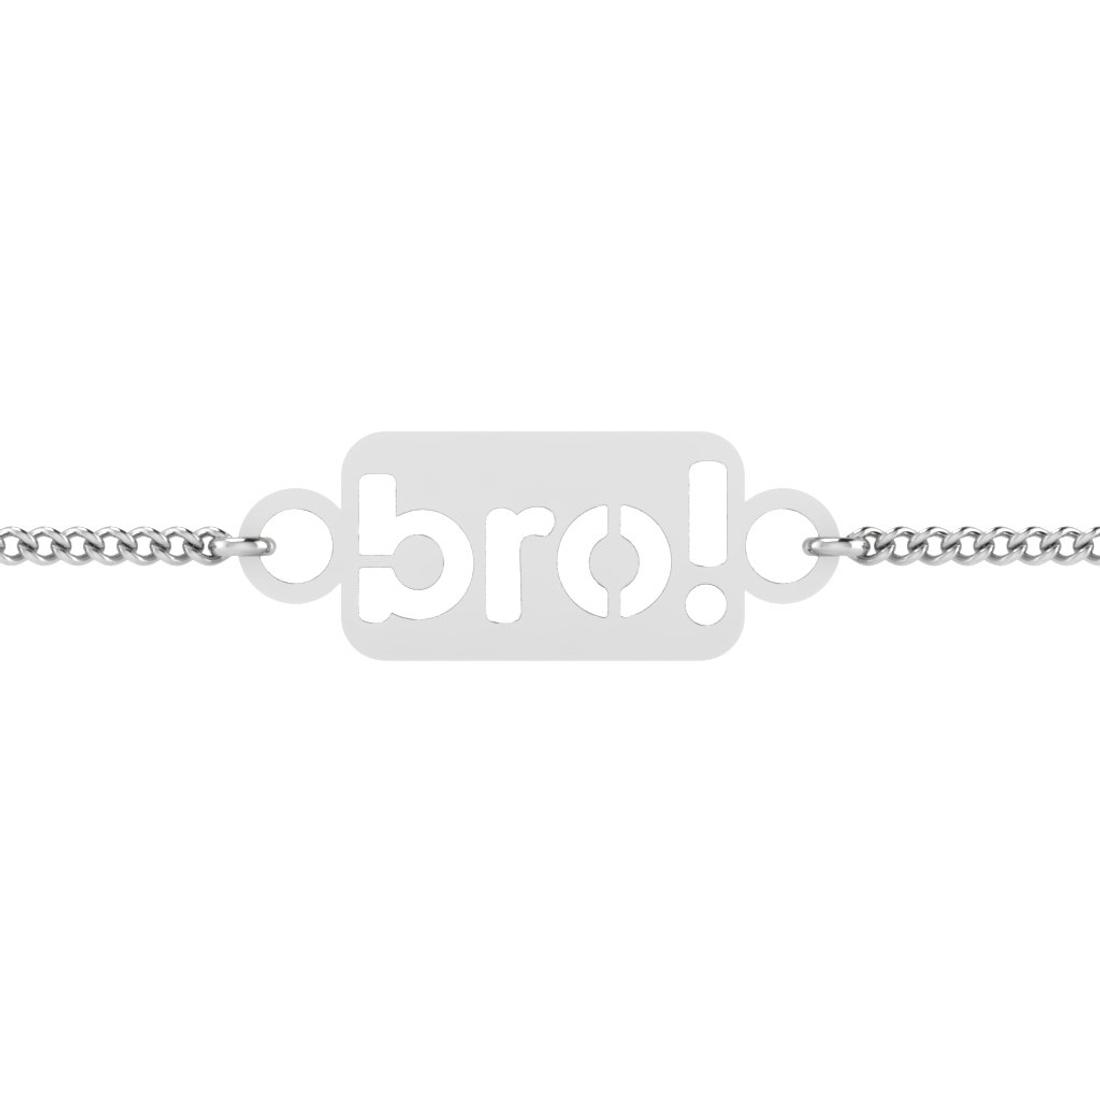 ISKI USKI 925 Silver Rakhi for Brother B-0017WR